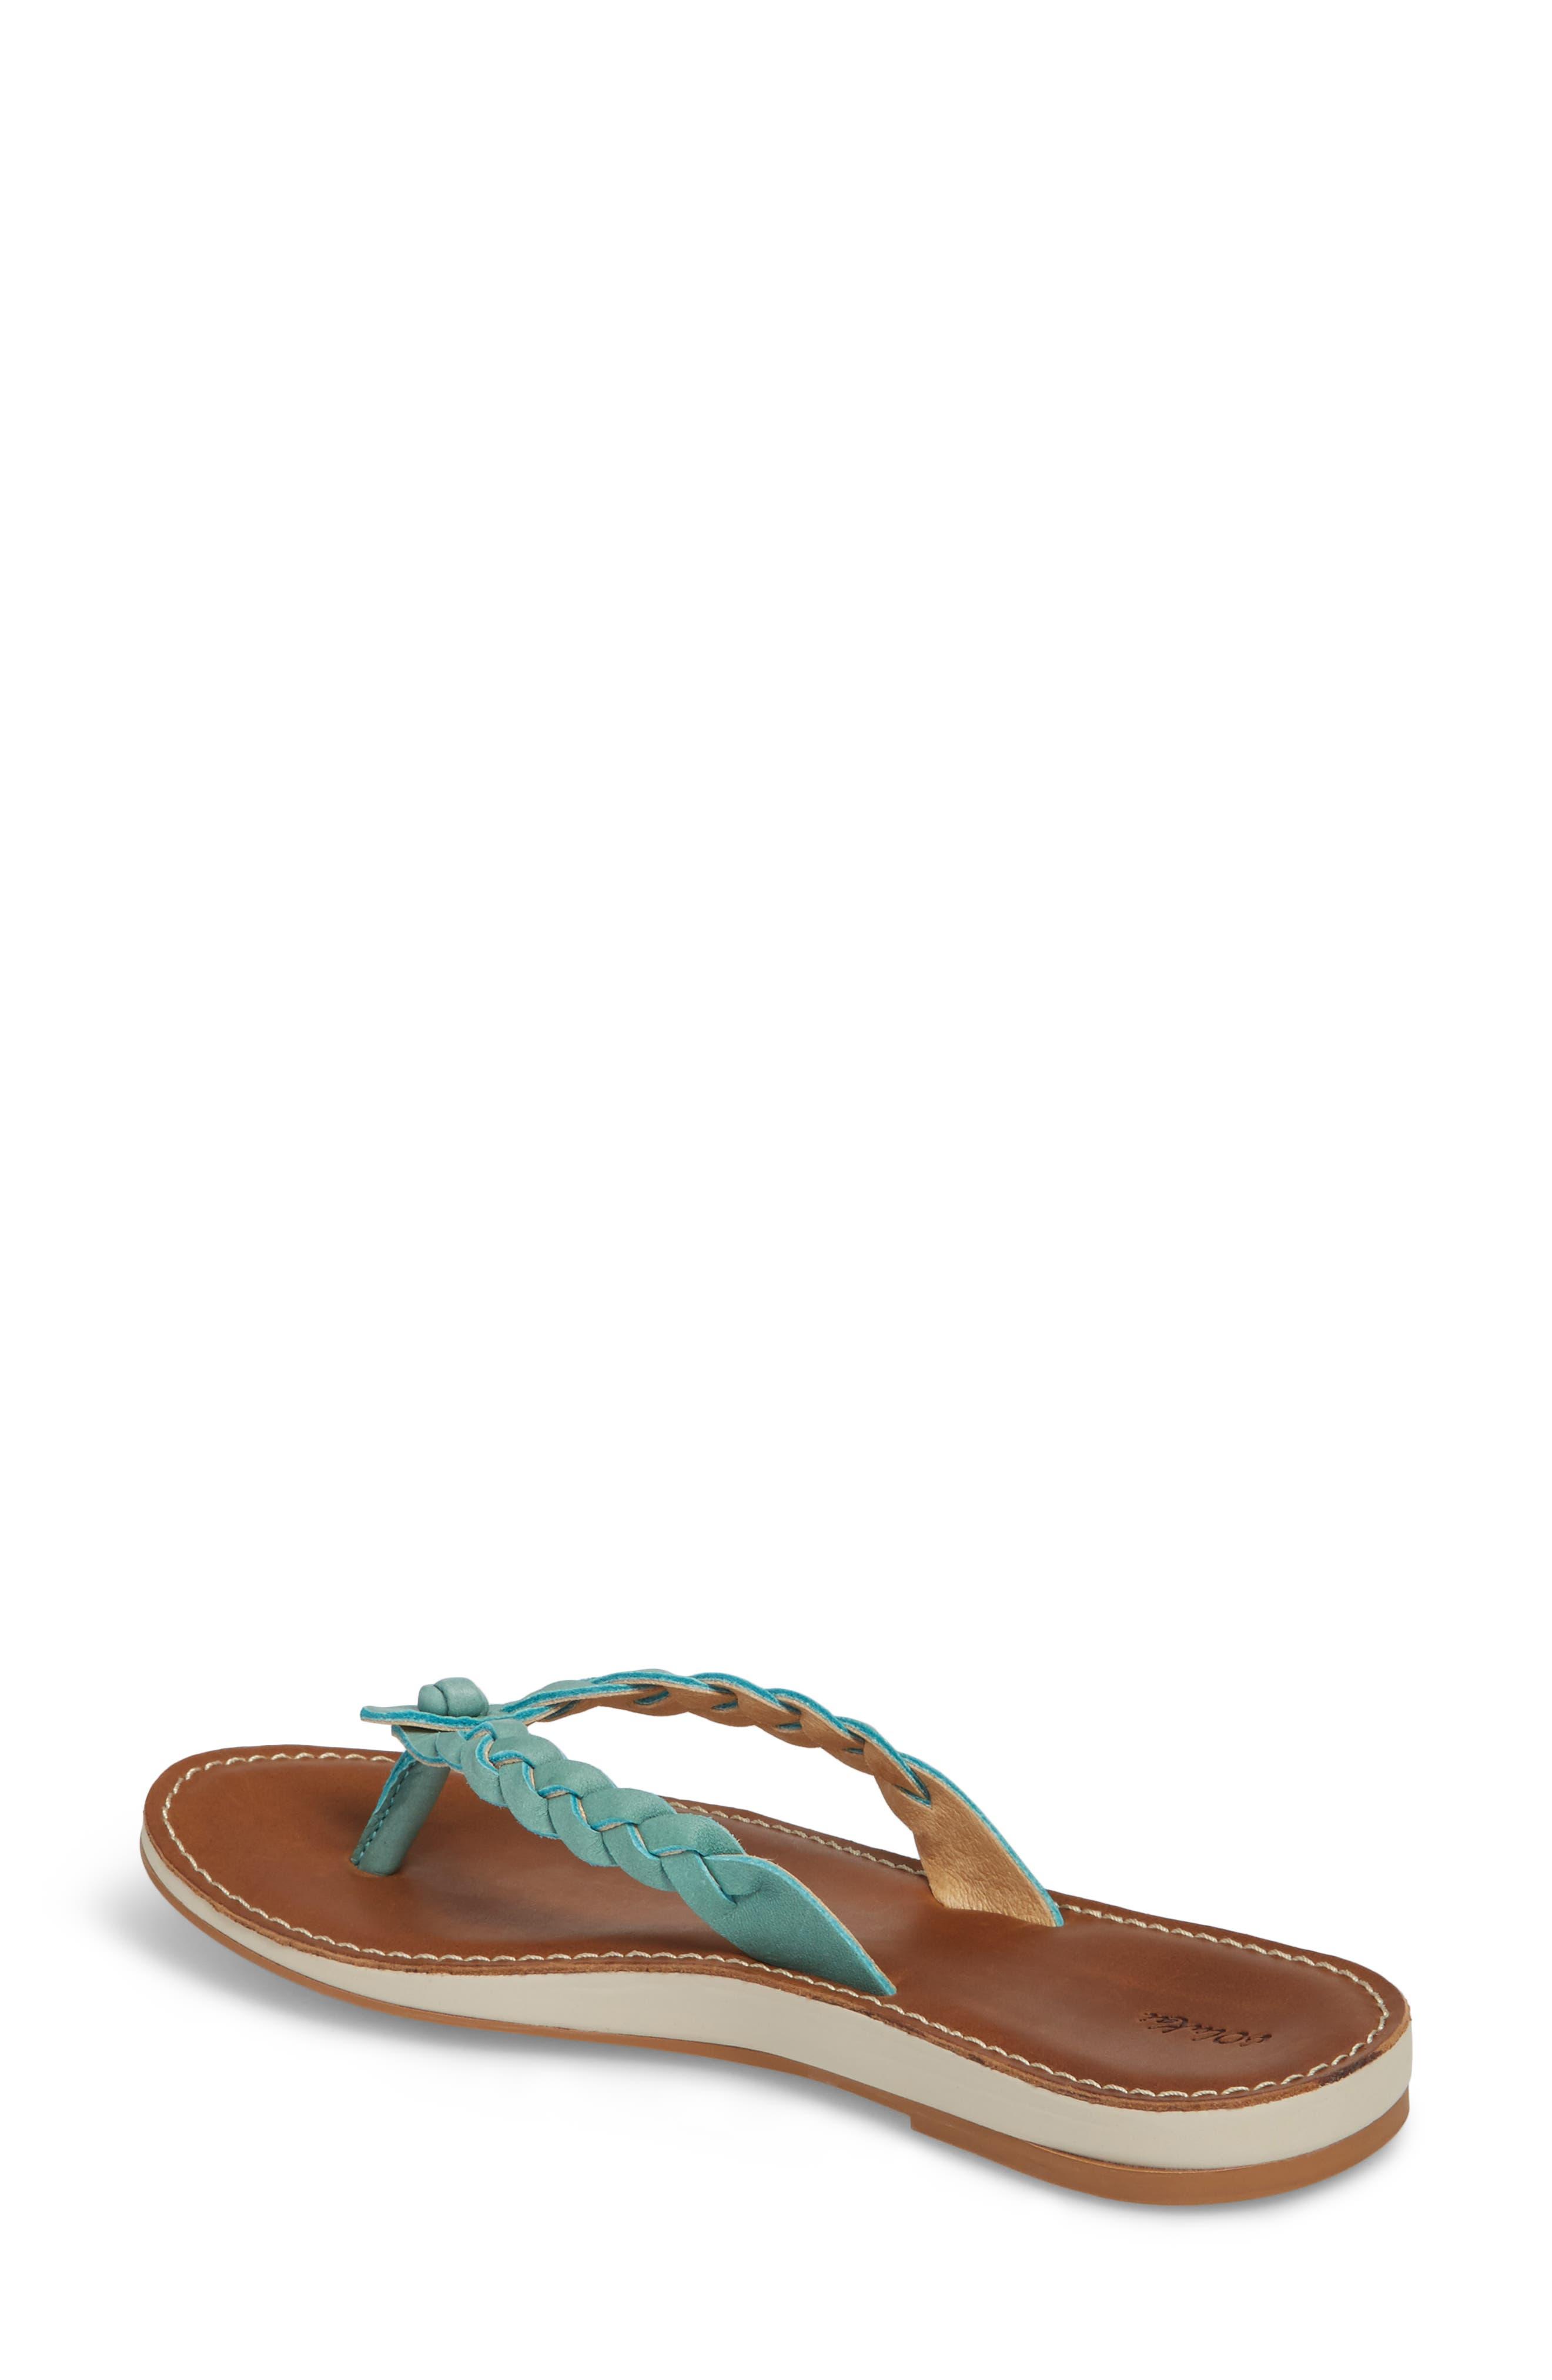 Kahiko Flip-Flop,                             Alternate thumbnail 2, color,                             Sea/ Tan Leather